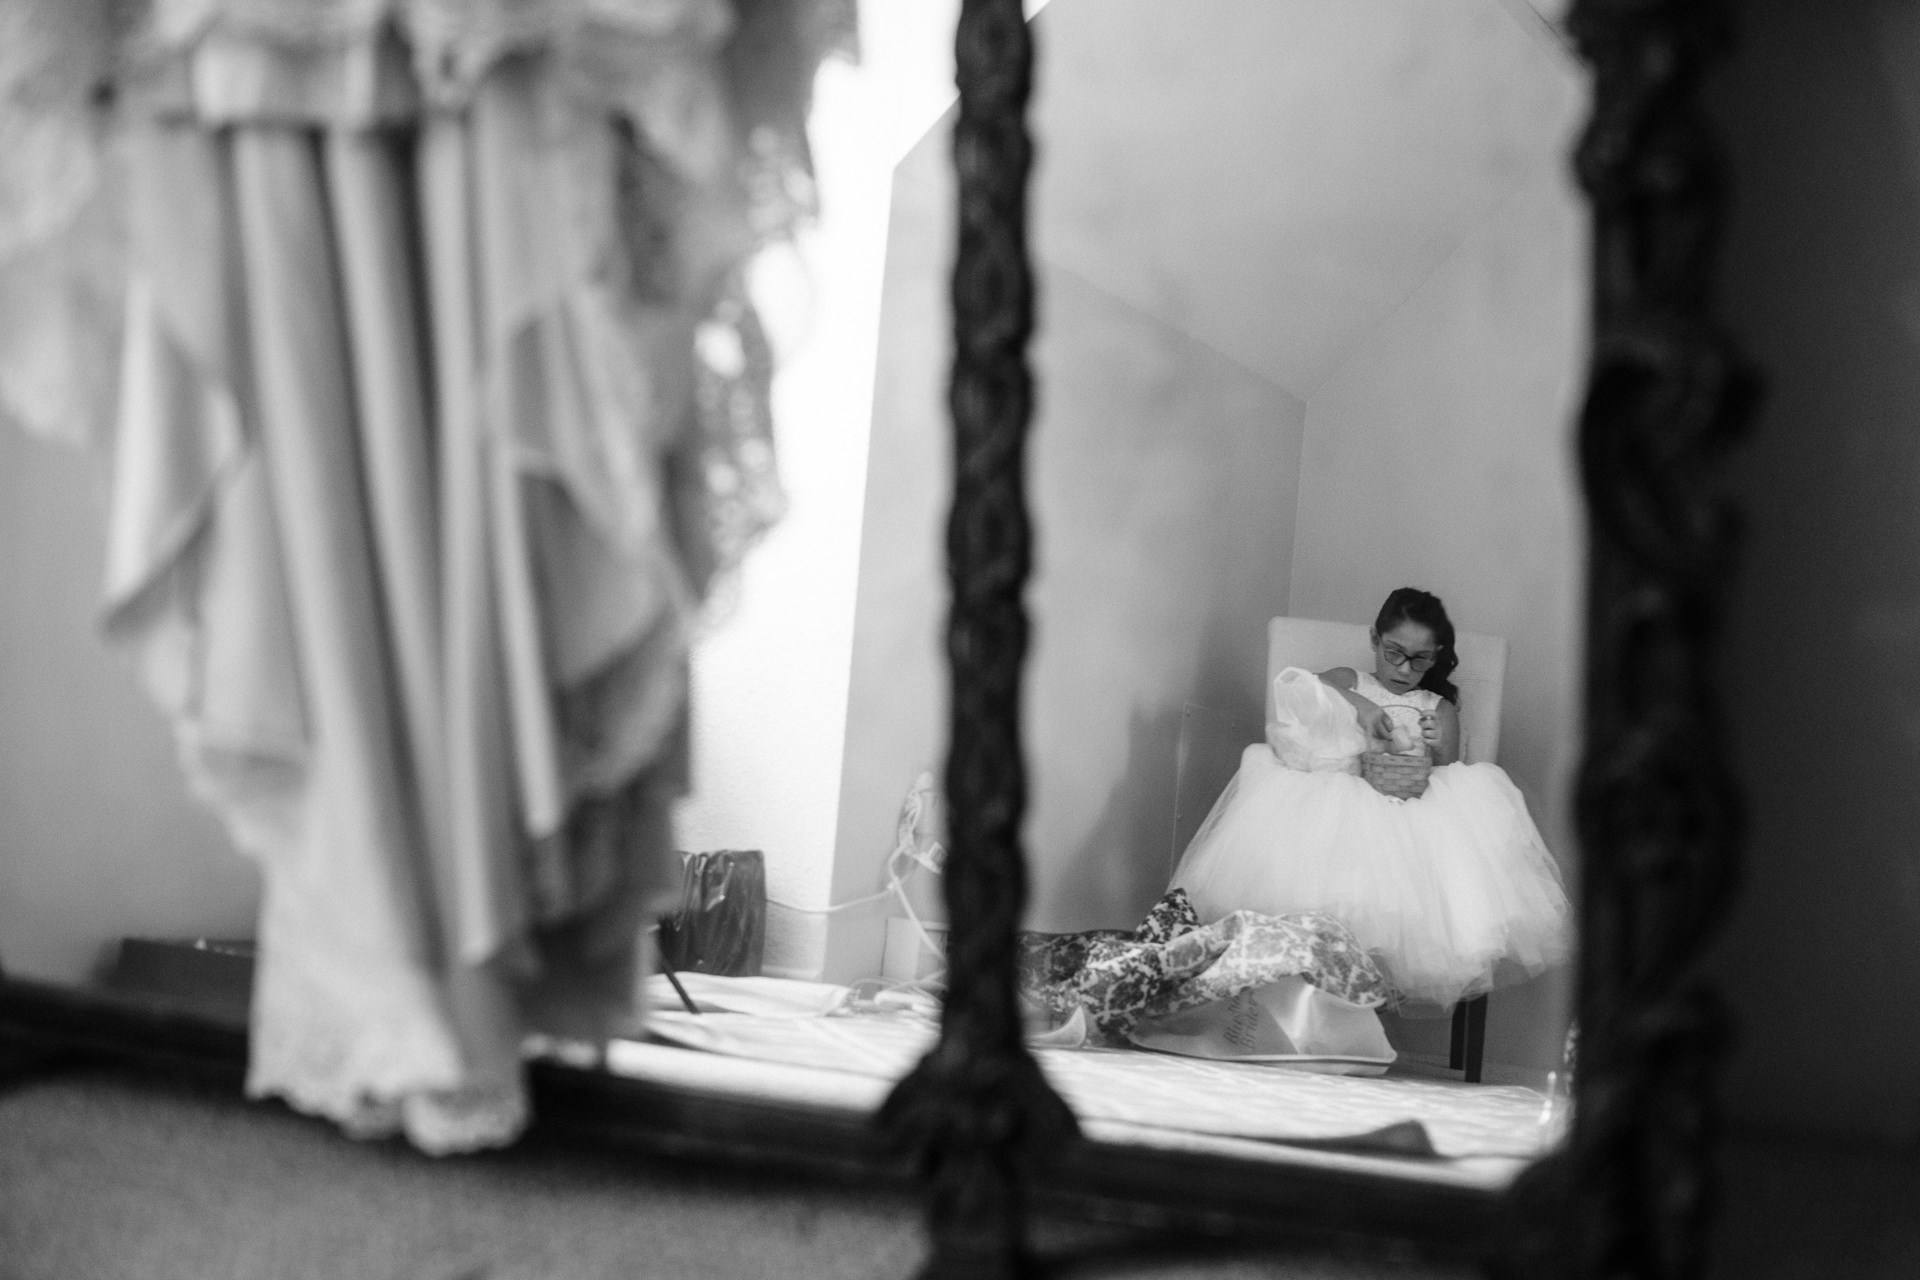 Grant Beachy Tammy Chris wedding photography goshen Saint Joseph veranda whitcomb-012.jpg